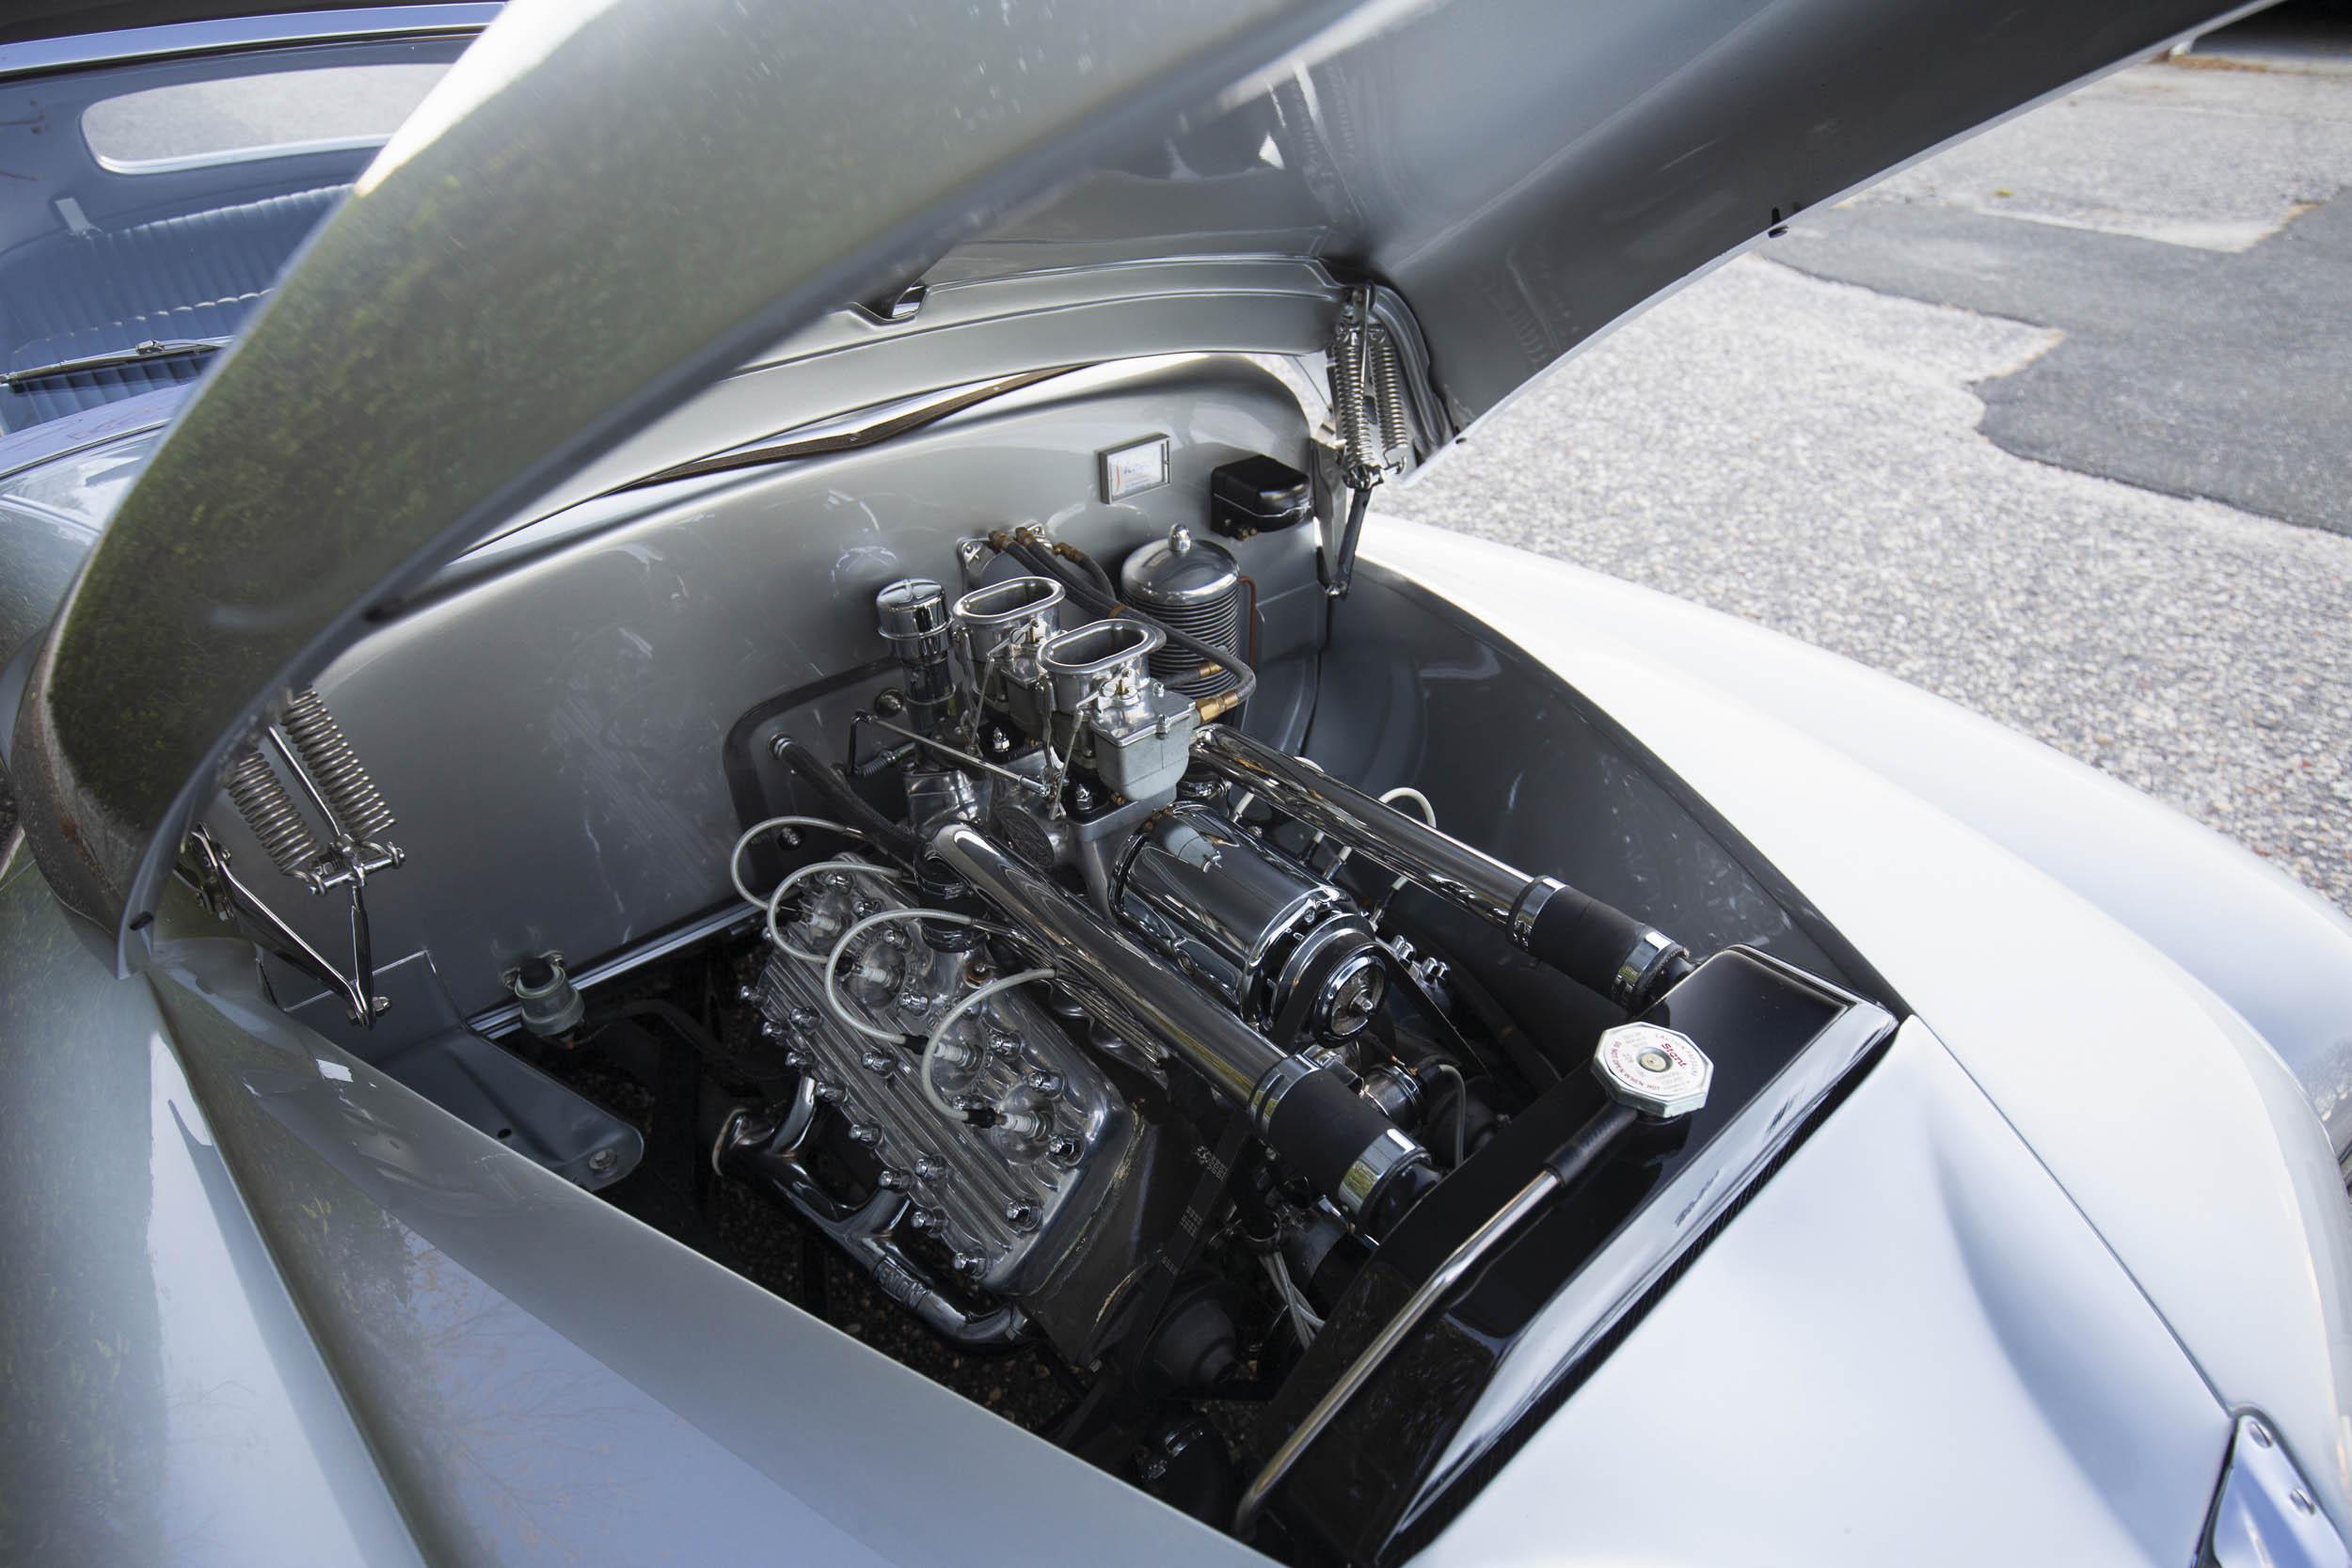 1941 Mercury Stengel Custom by Coachcraft engine